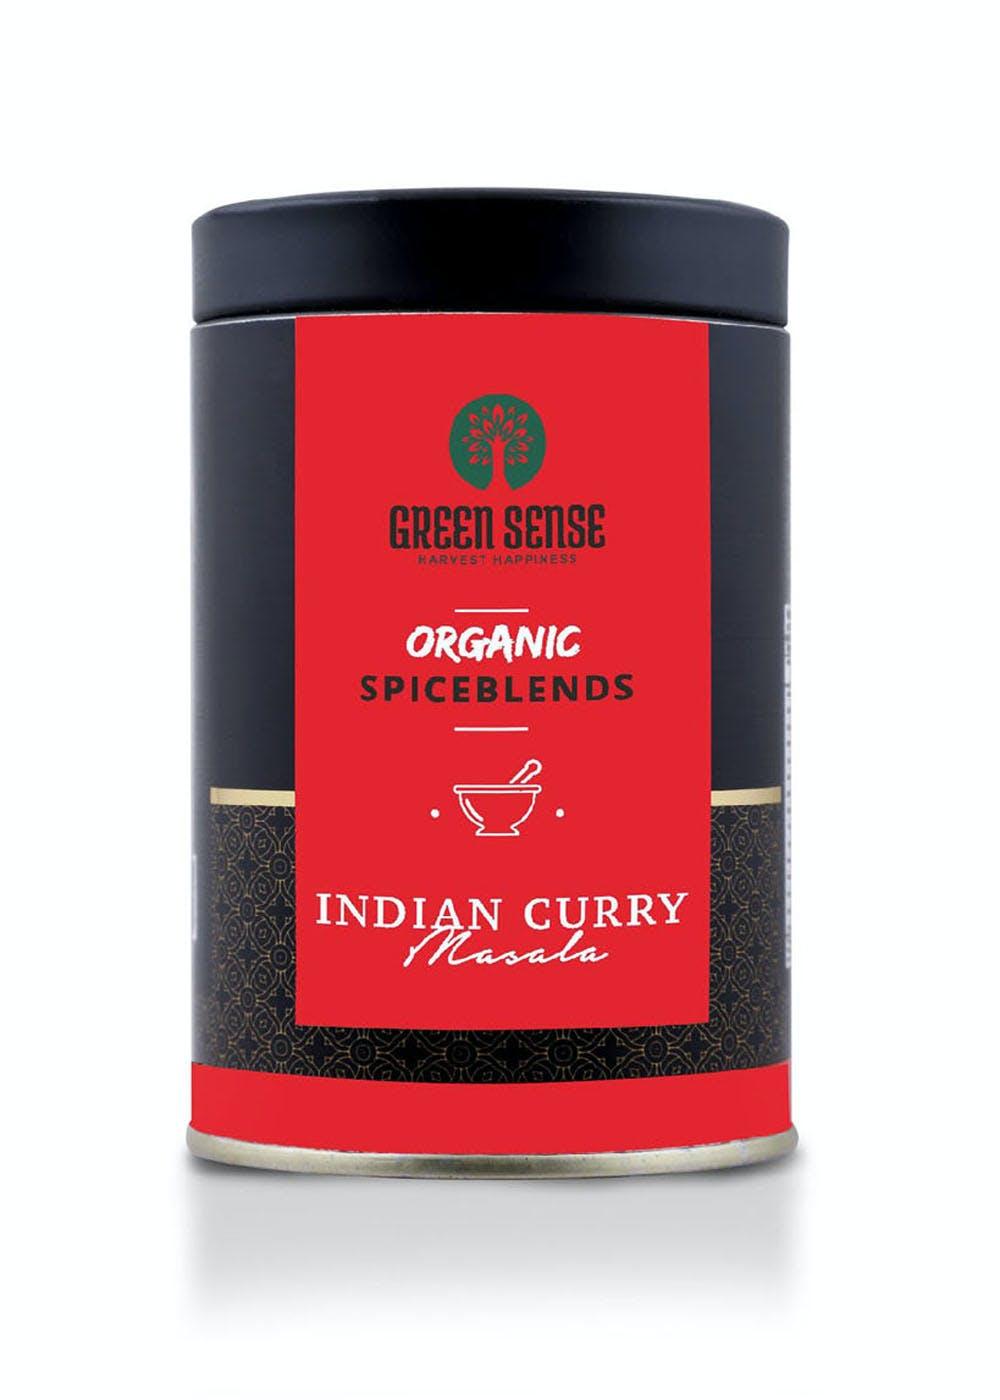 Organic Spiceblends - Indian Curry Powder